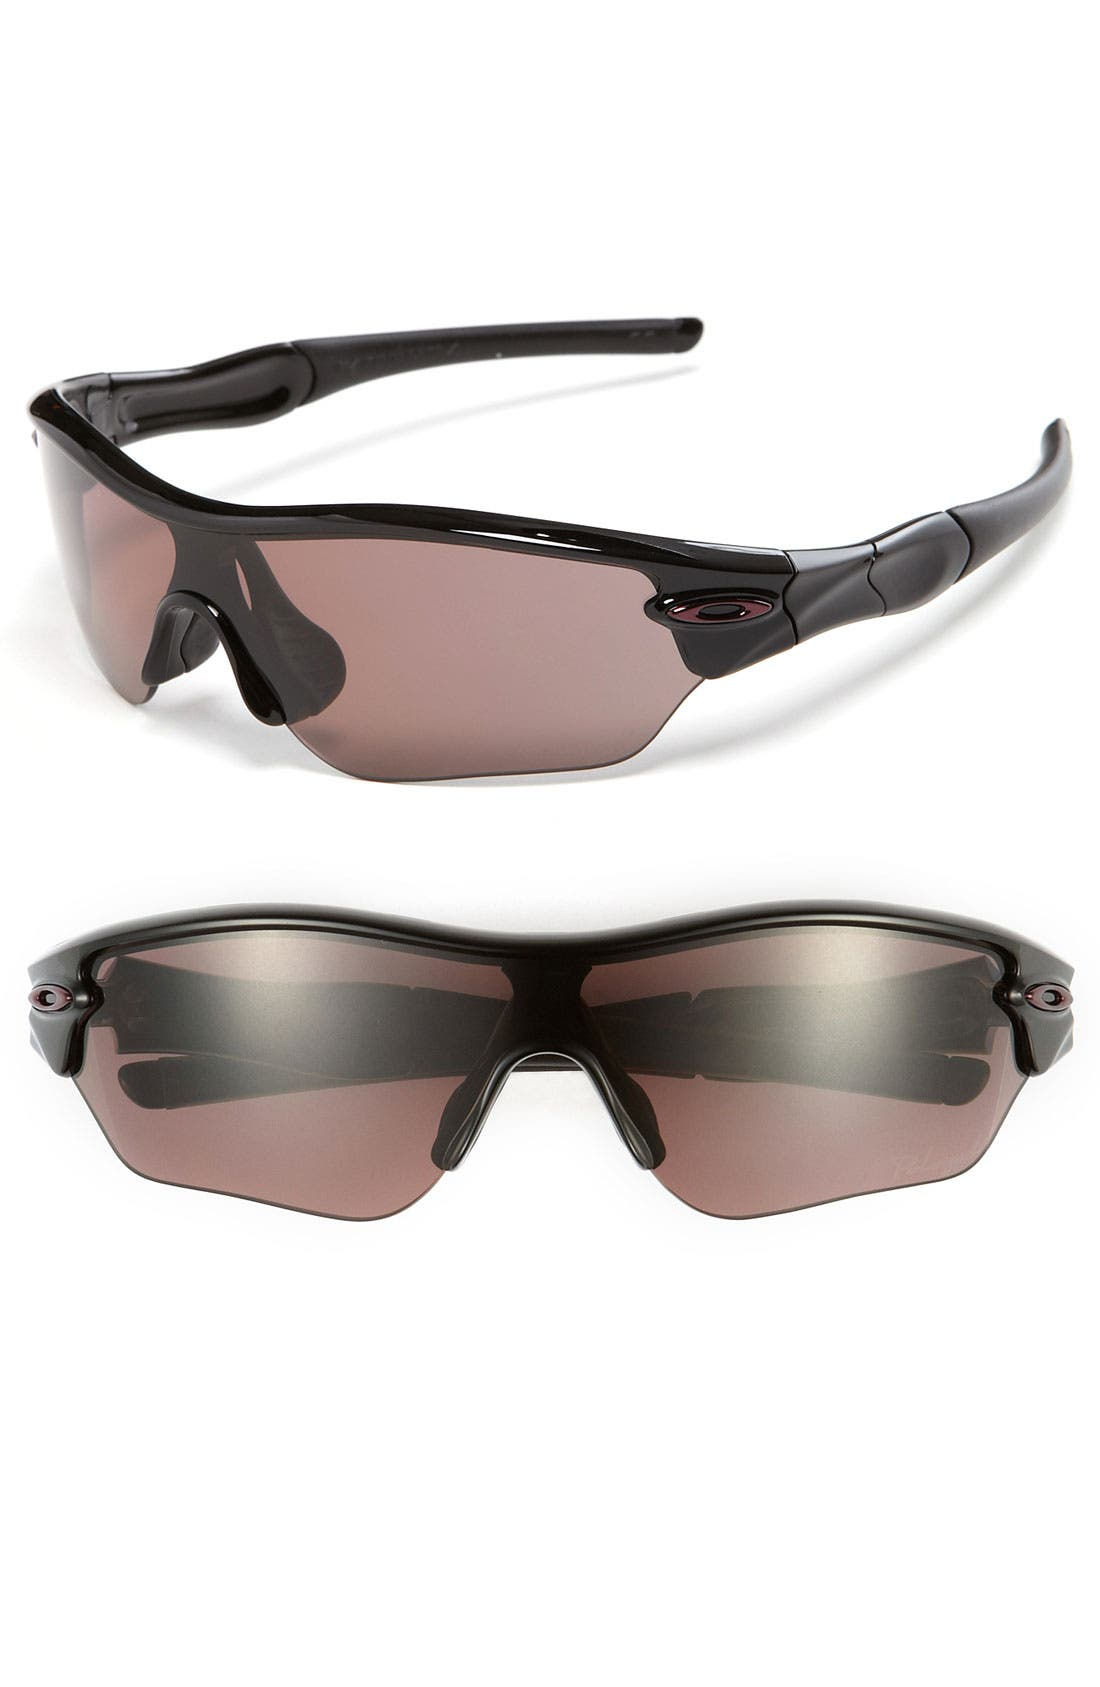 Alternate Image 1 Selected - Oakley 'Radar® Edge™' 135mm Polarized Sunglasses